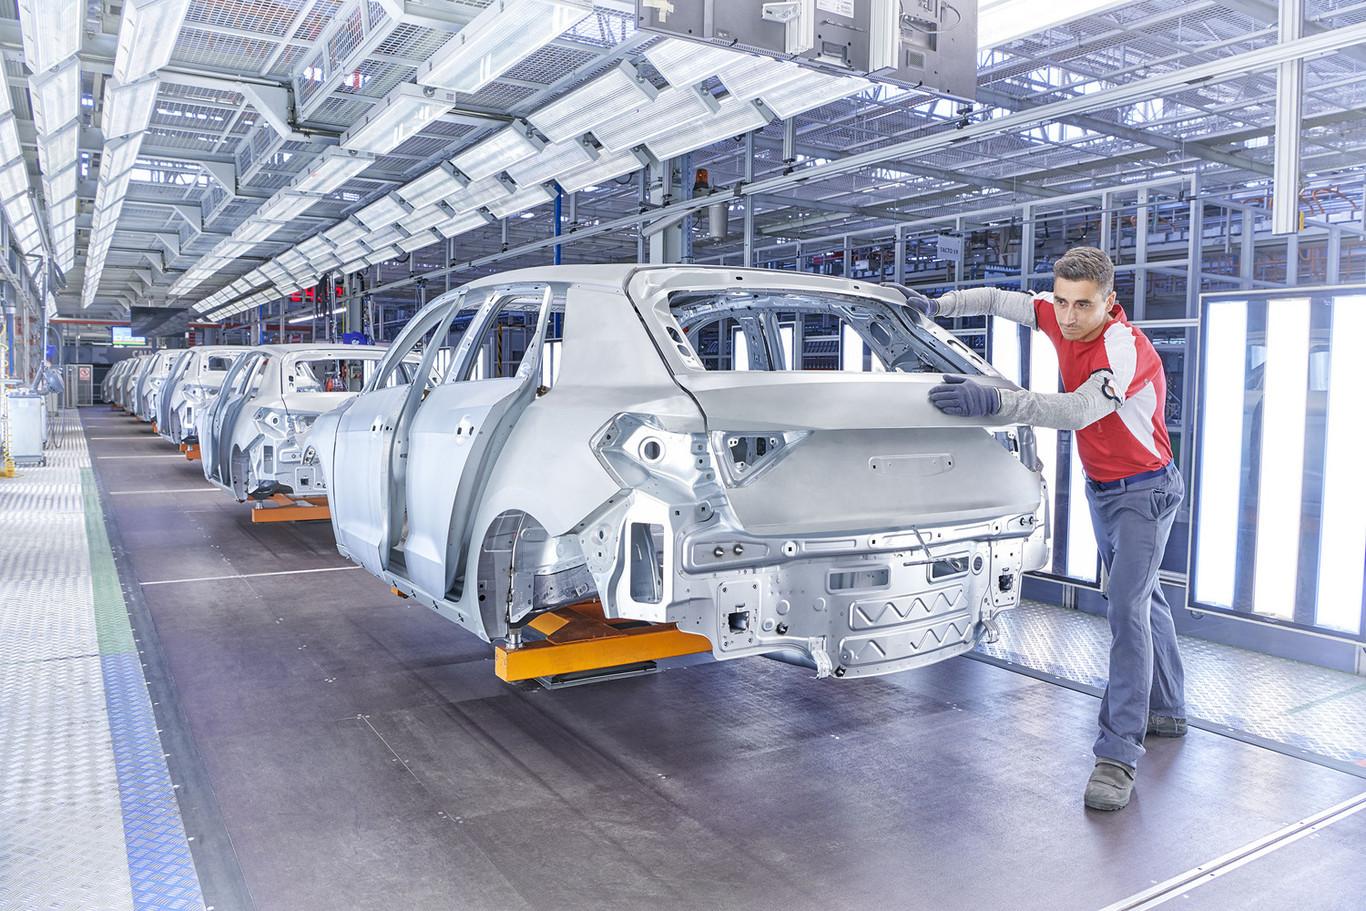 Juarez sees opportunity in the manufacture of autonomous cars